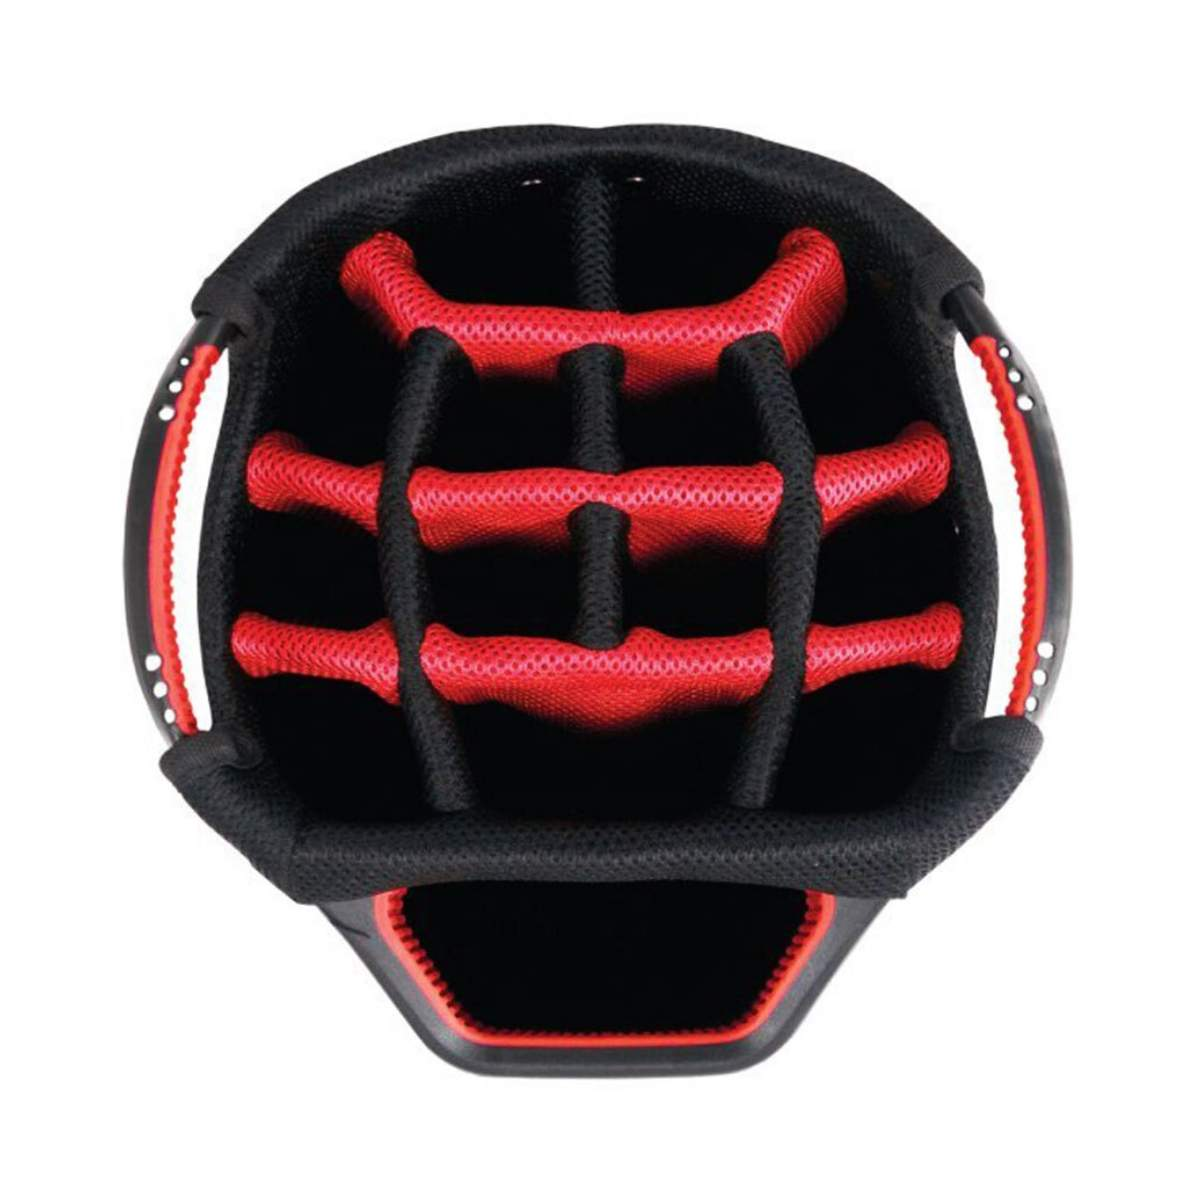 Bag Boy 2020 Chiller Cart Bag